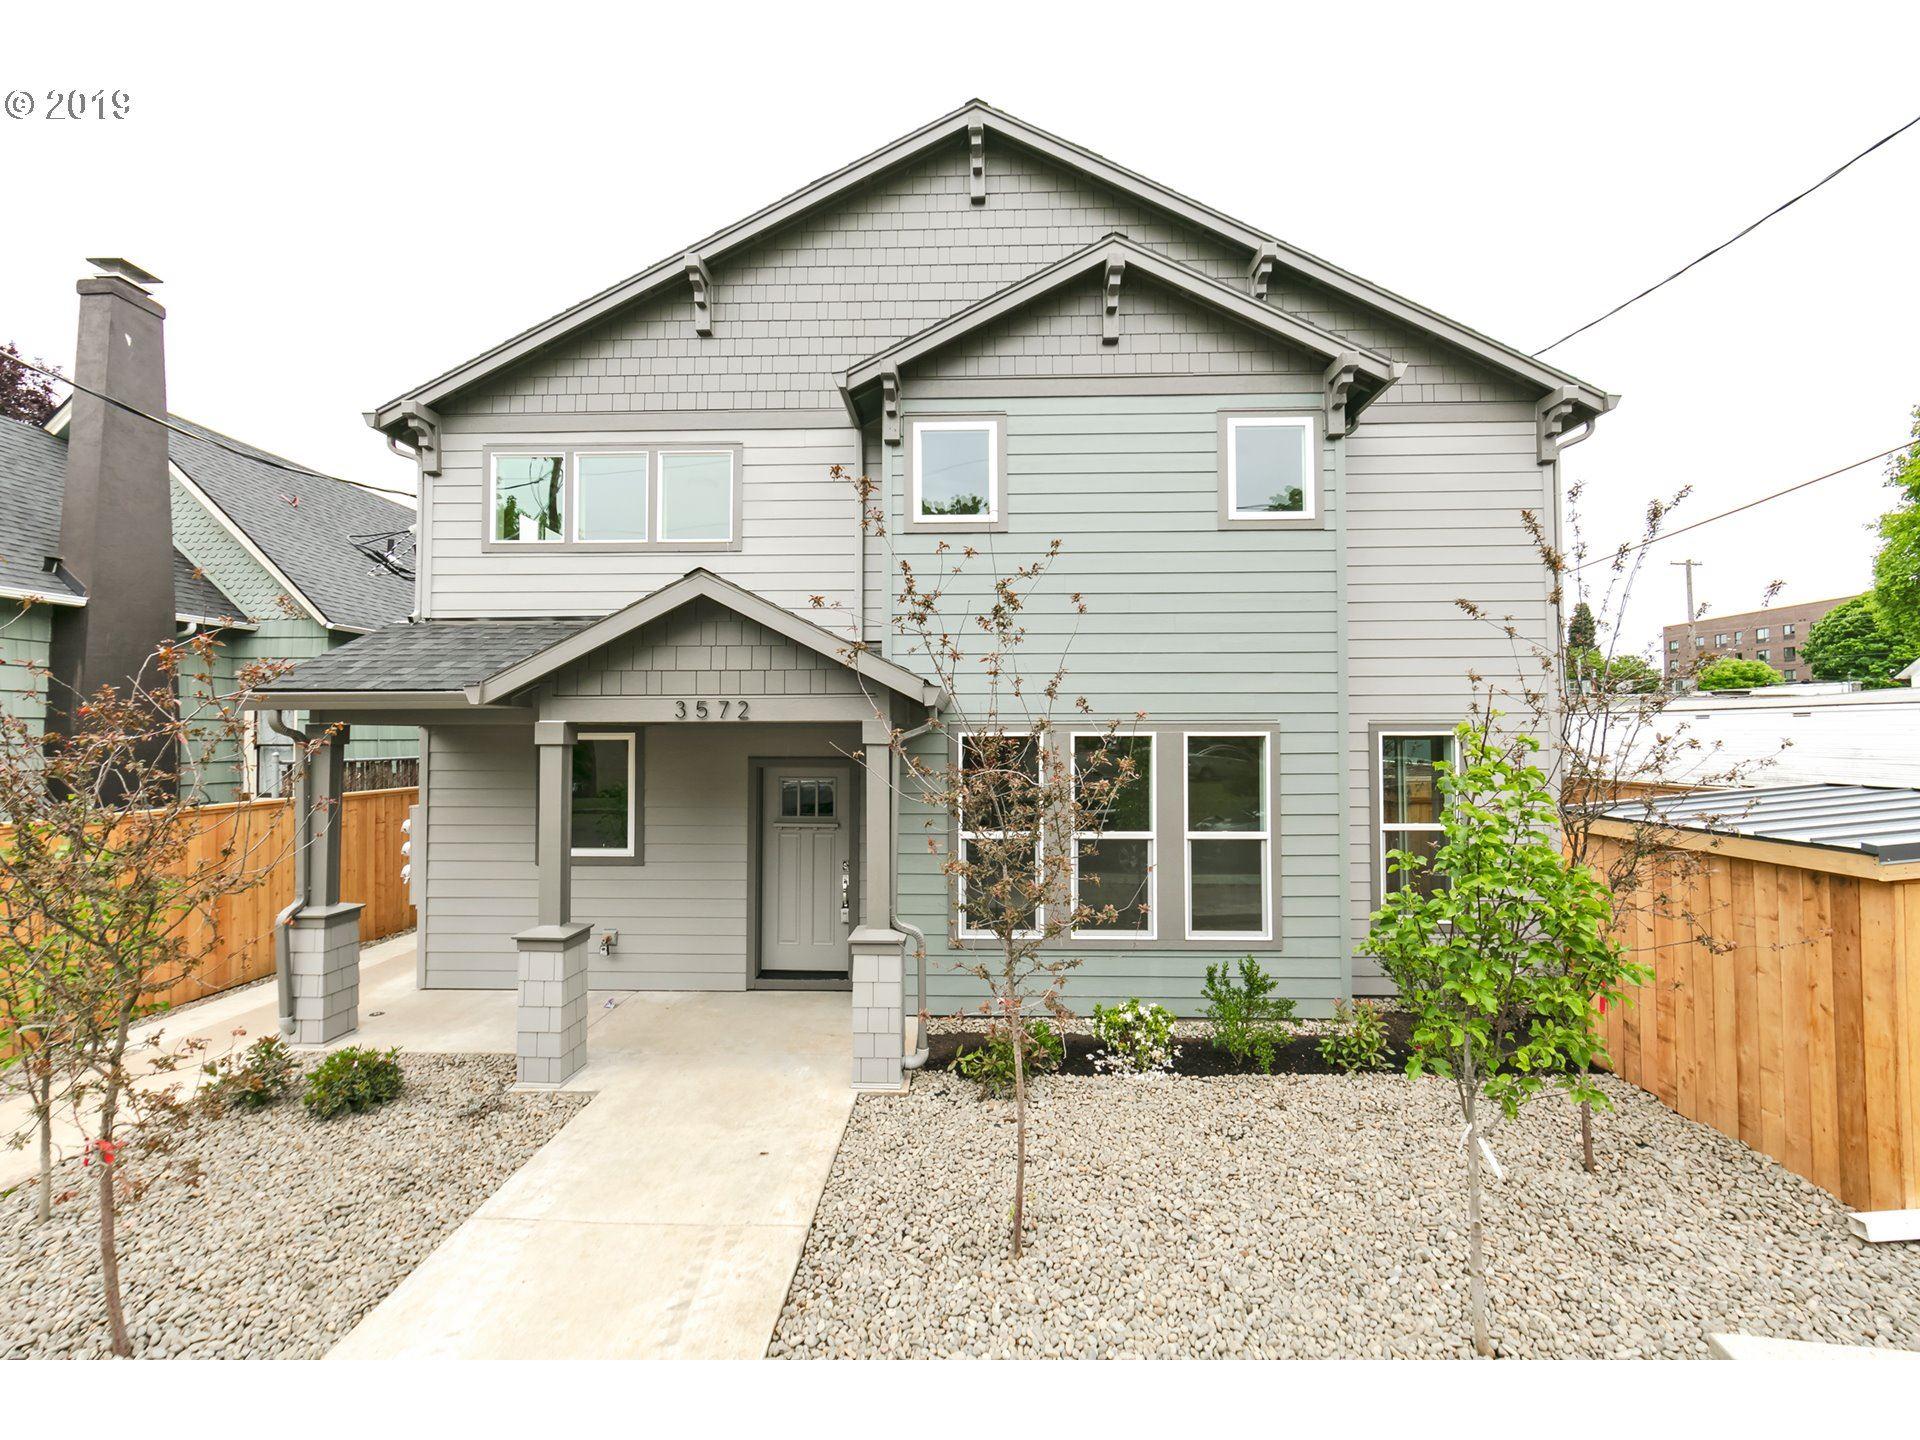 3572 NE GARFIELD AVE, Portland, OR 97212 - MLS#: 20113147